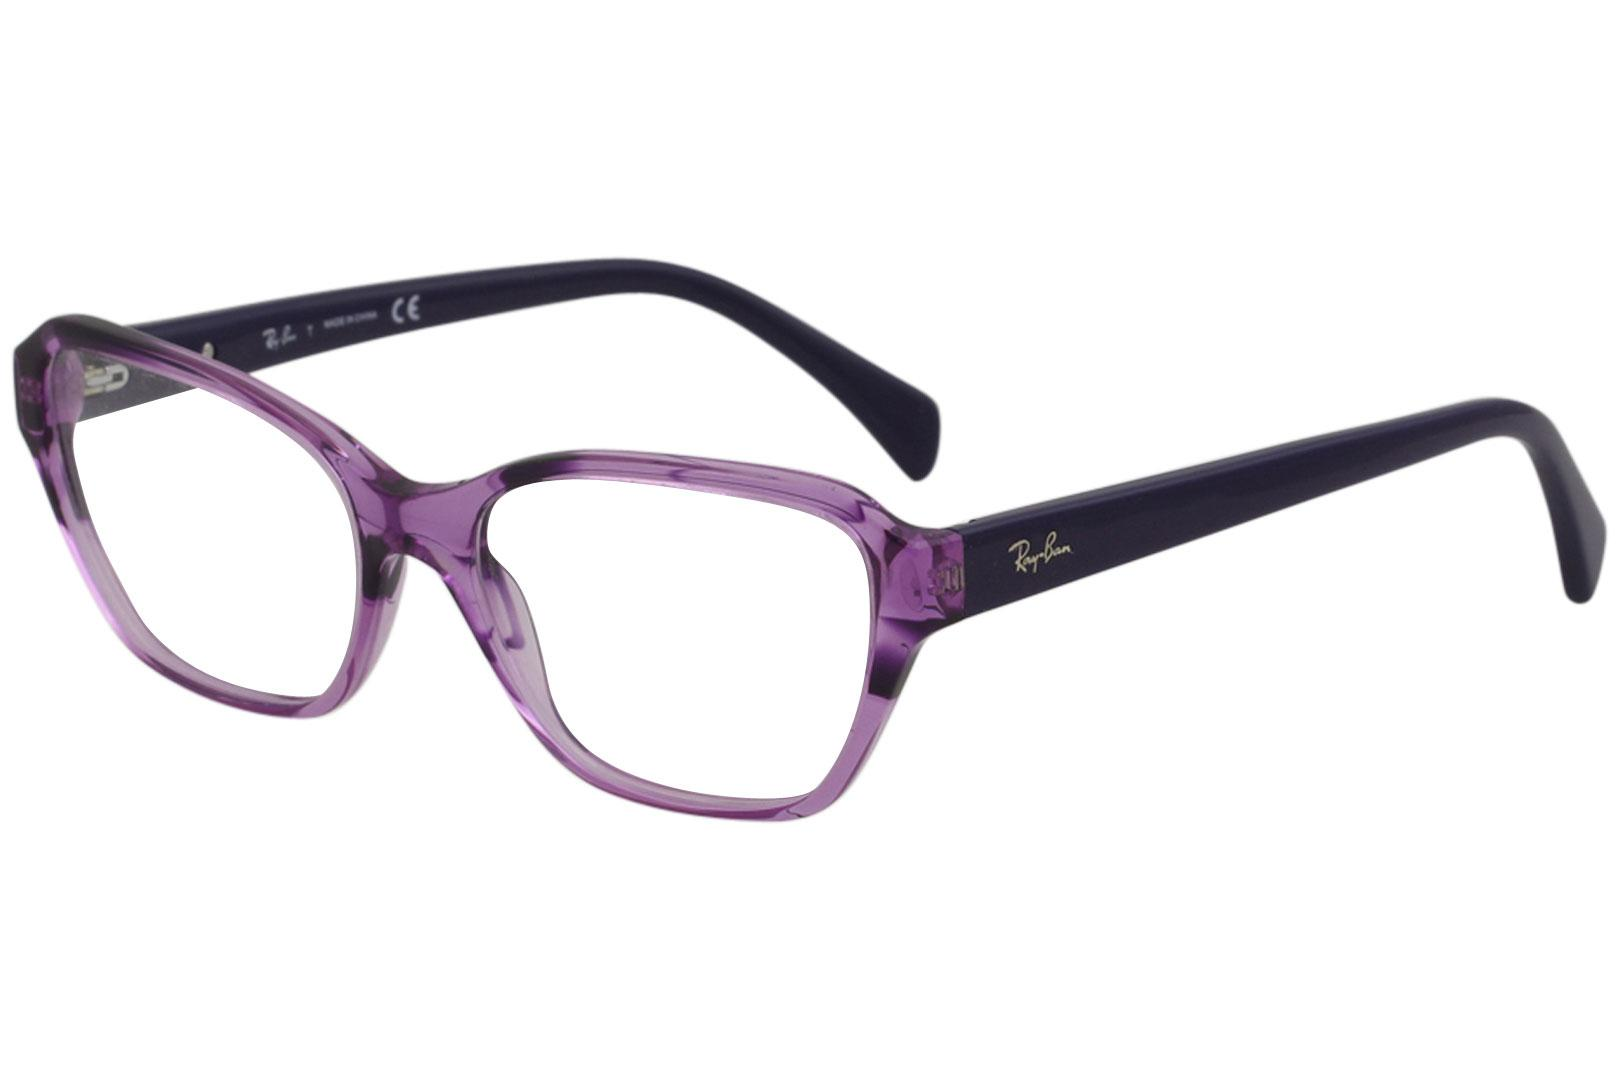 ecf59aeba110 Ray Ban Women s Eyeglasses RX5341 RX 5341 RayBan Full Rim Optical Frame